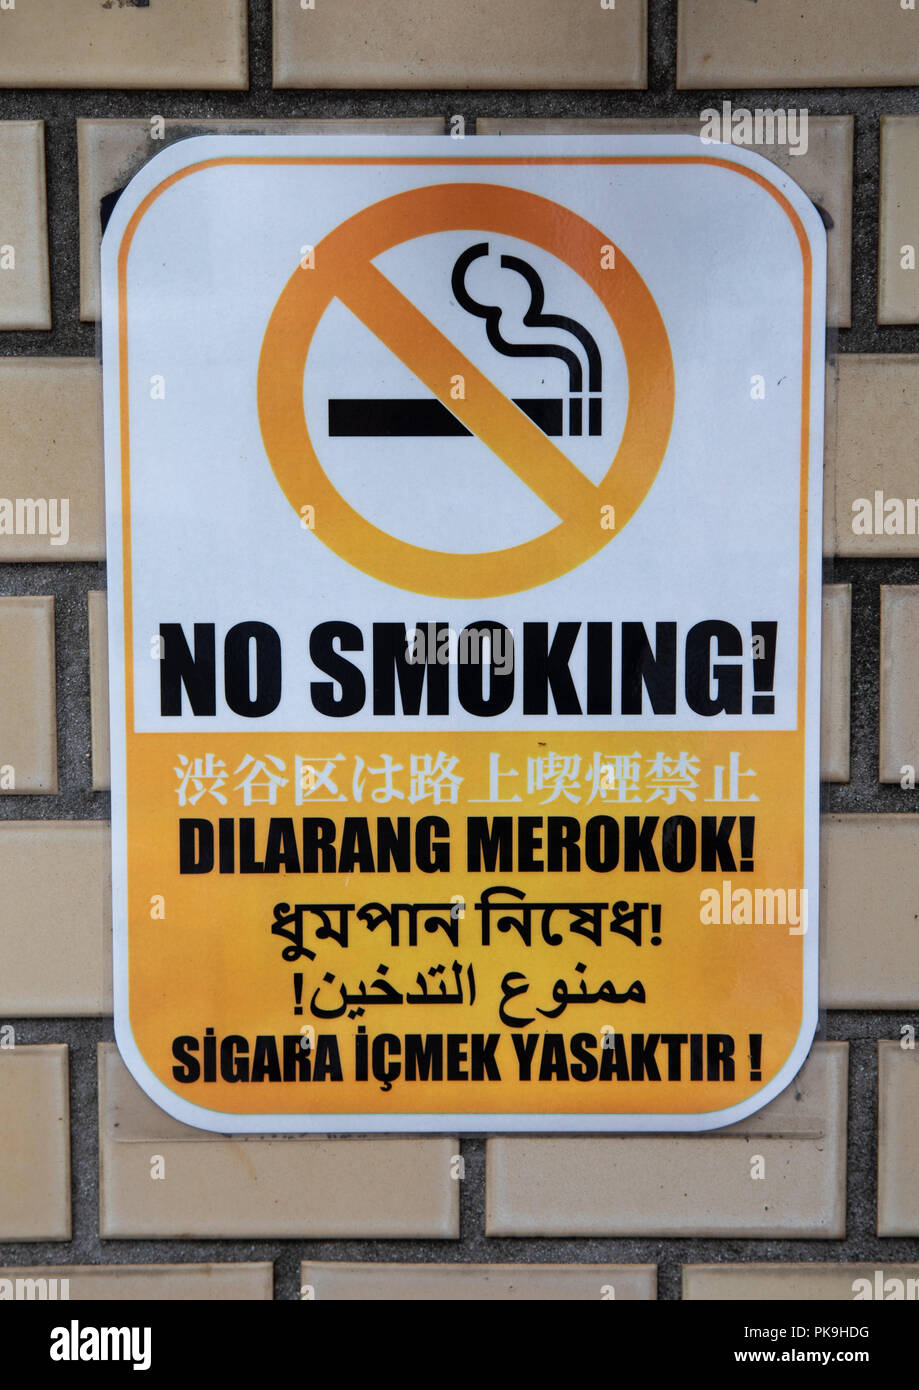 No smoking billboard in oyama-cho Tokyo Camii mosque, Kanto region, Tokyo, Japan - Stock Image